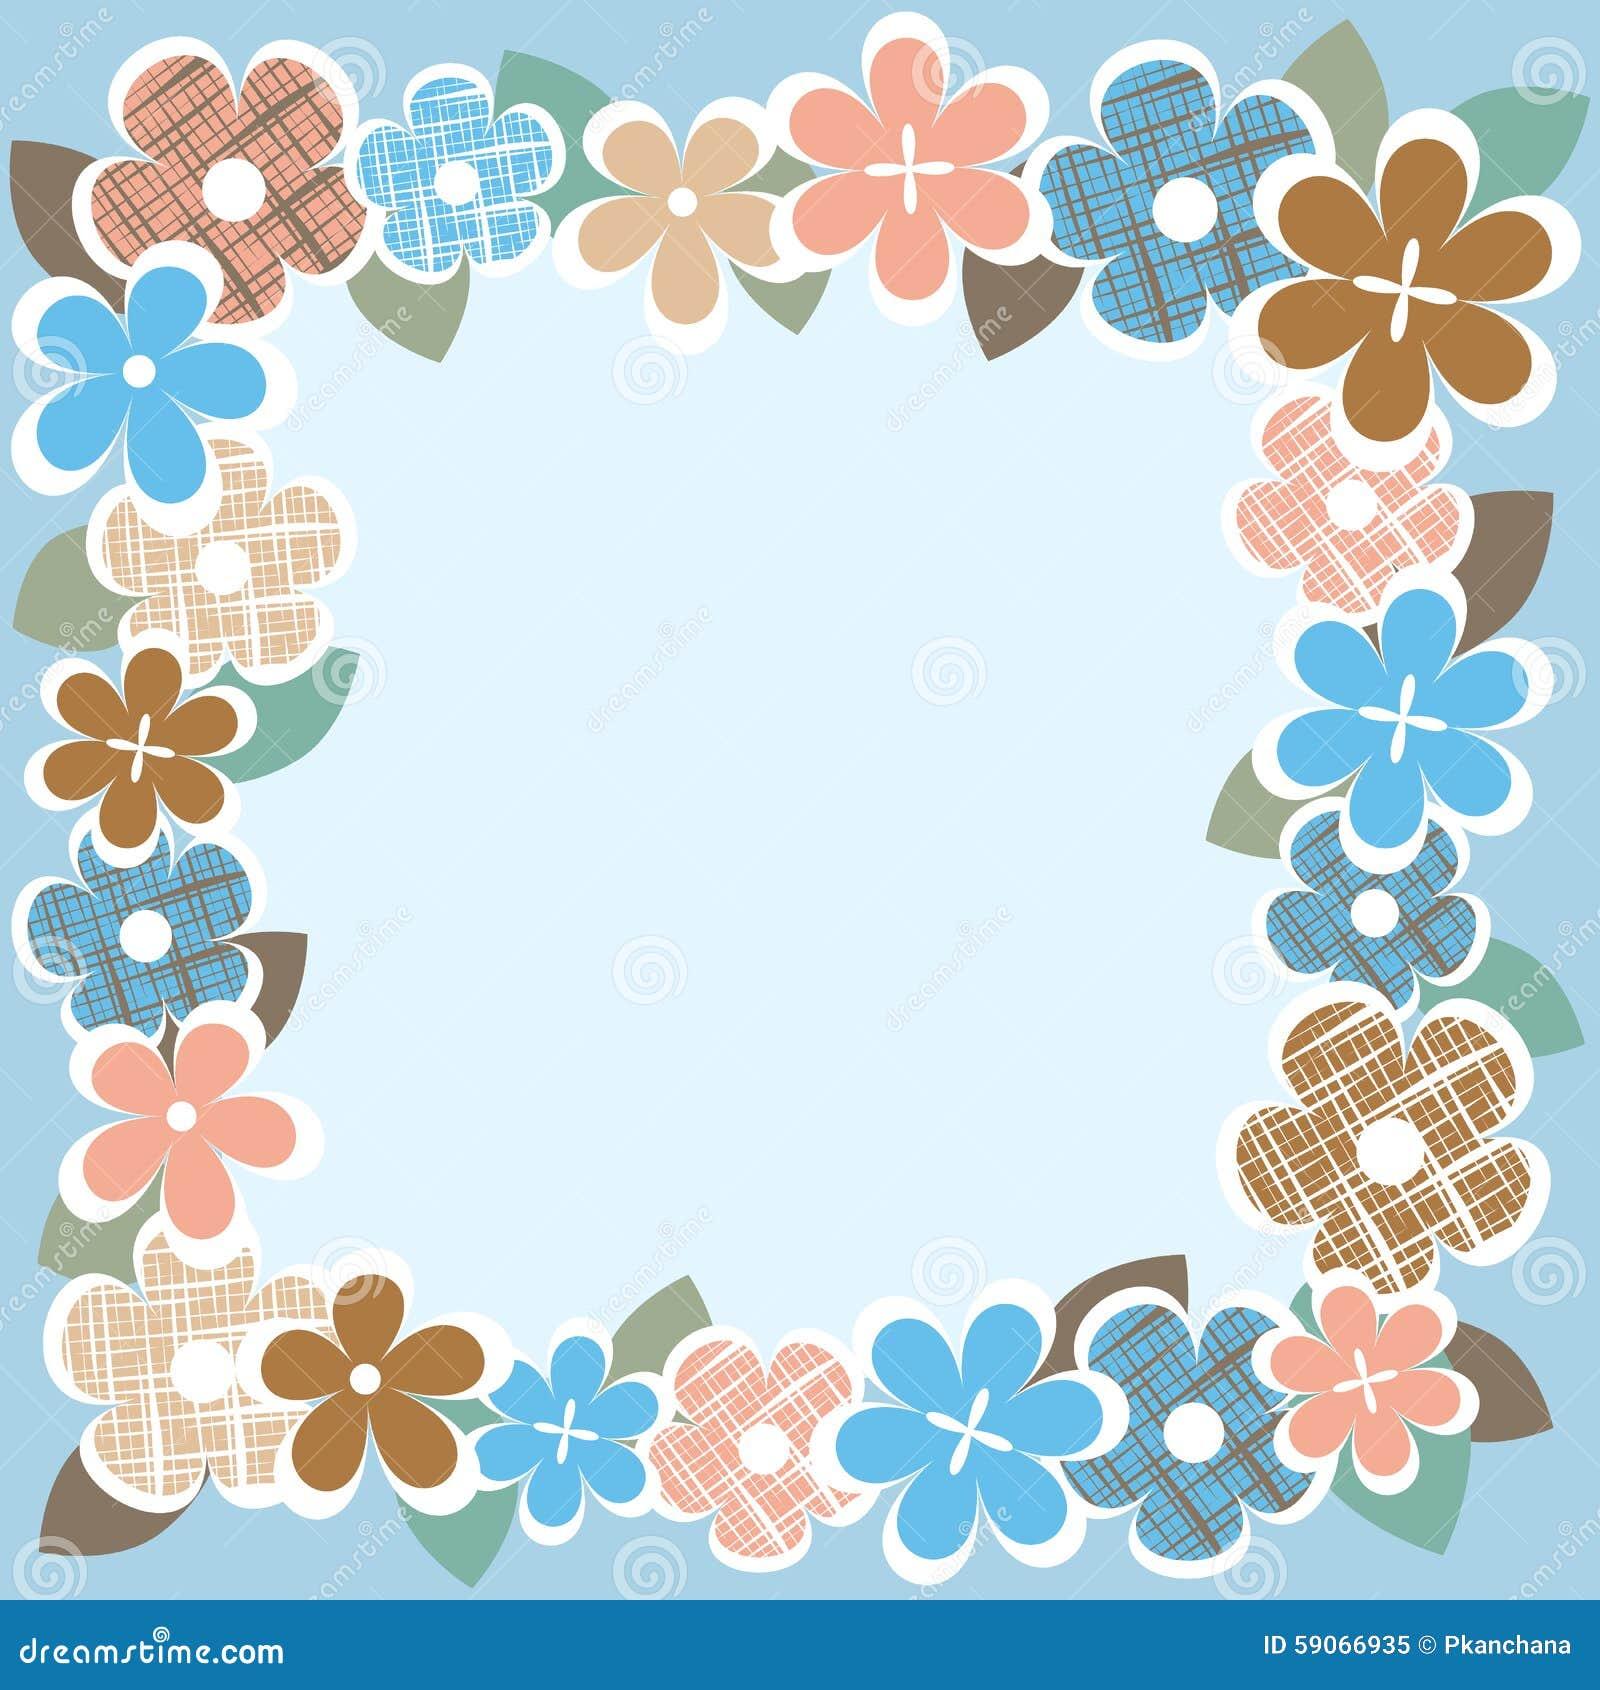 Vintage Flower Border Stock Vector Illustration Of Decorative